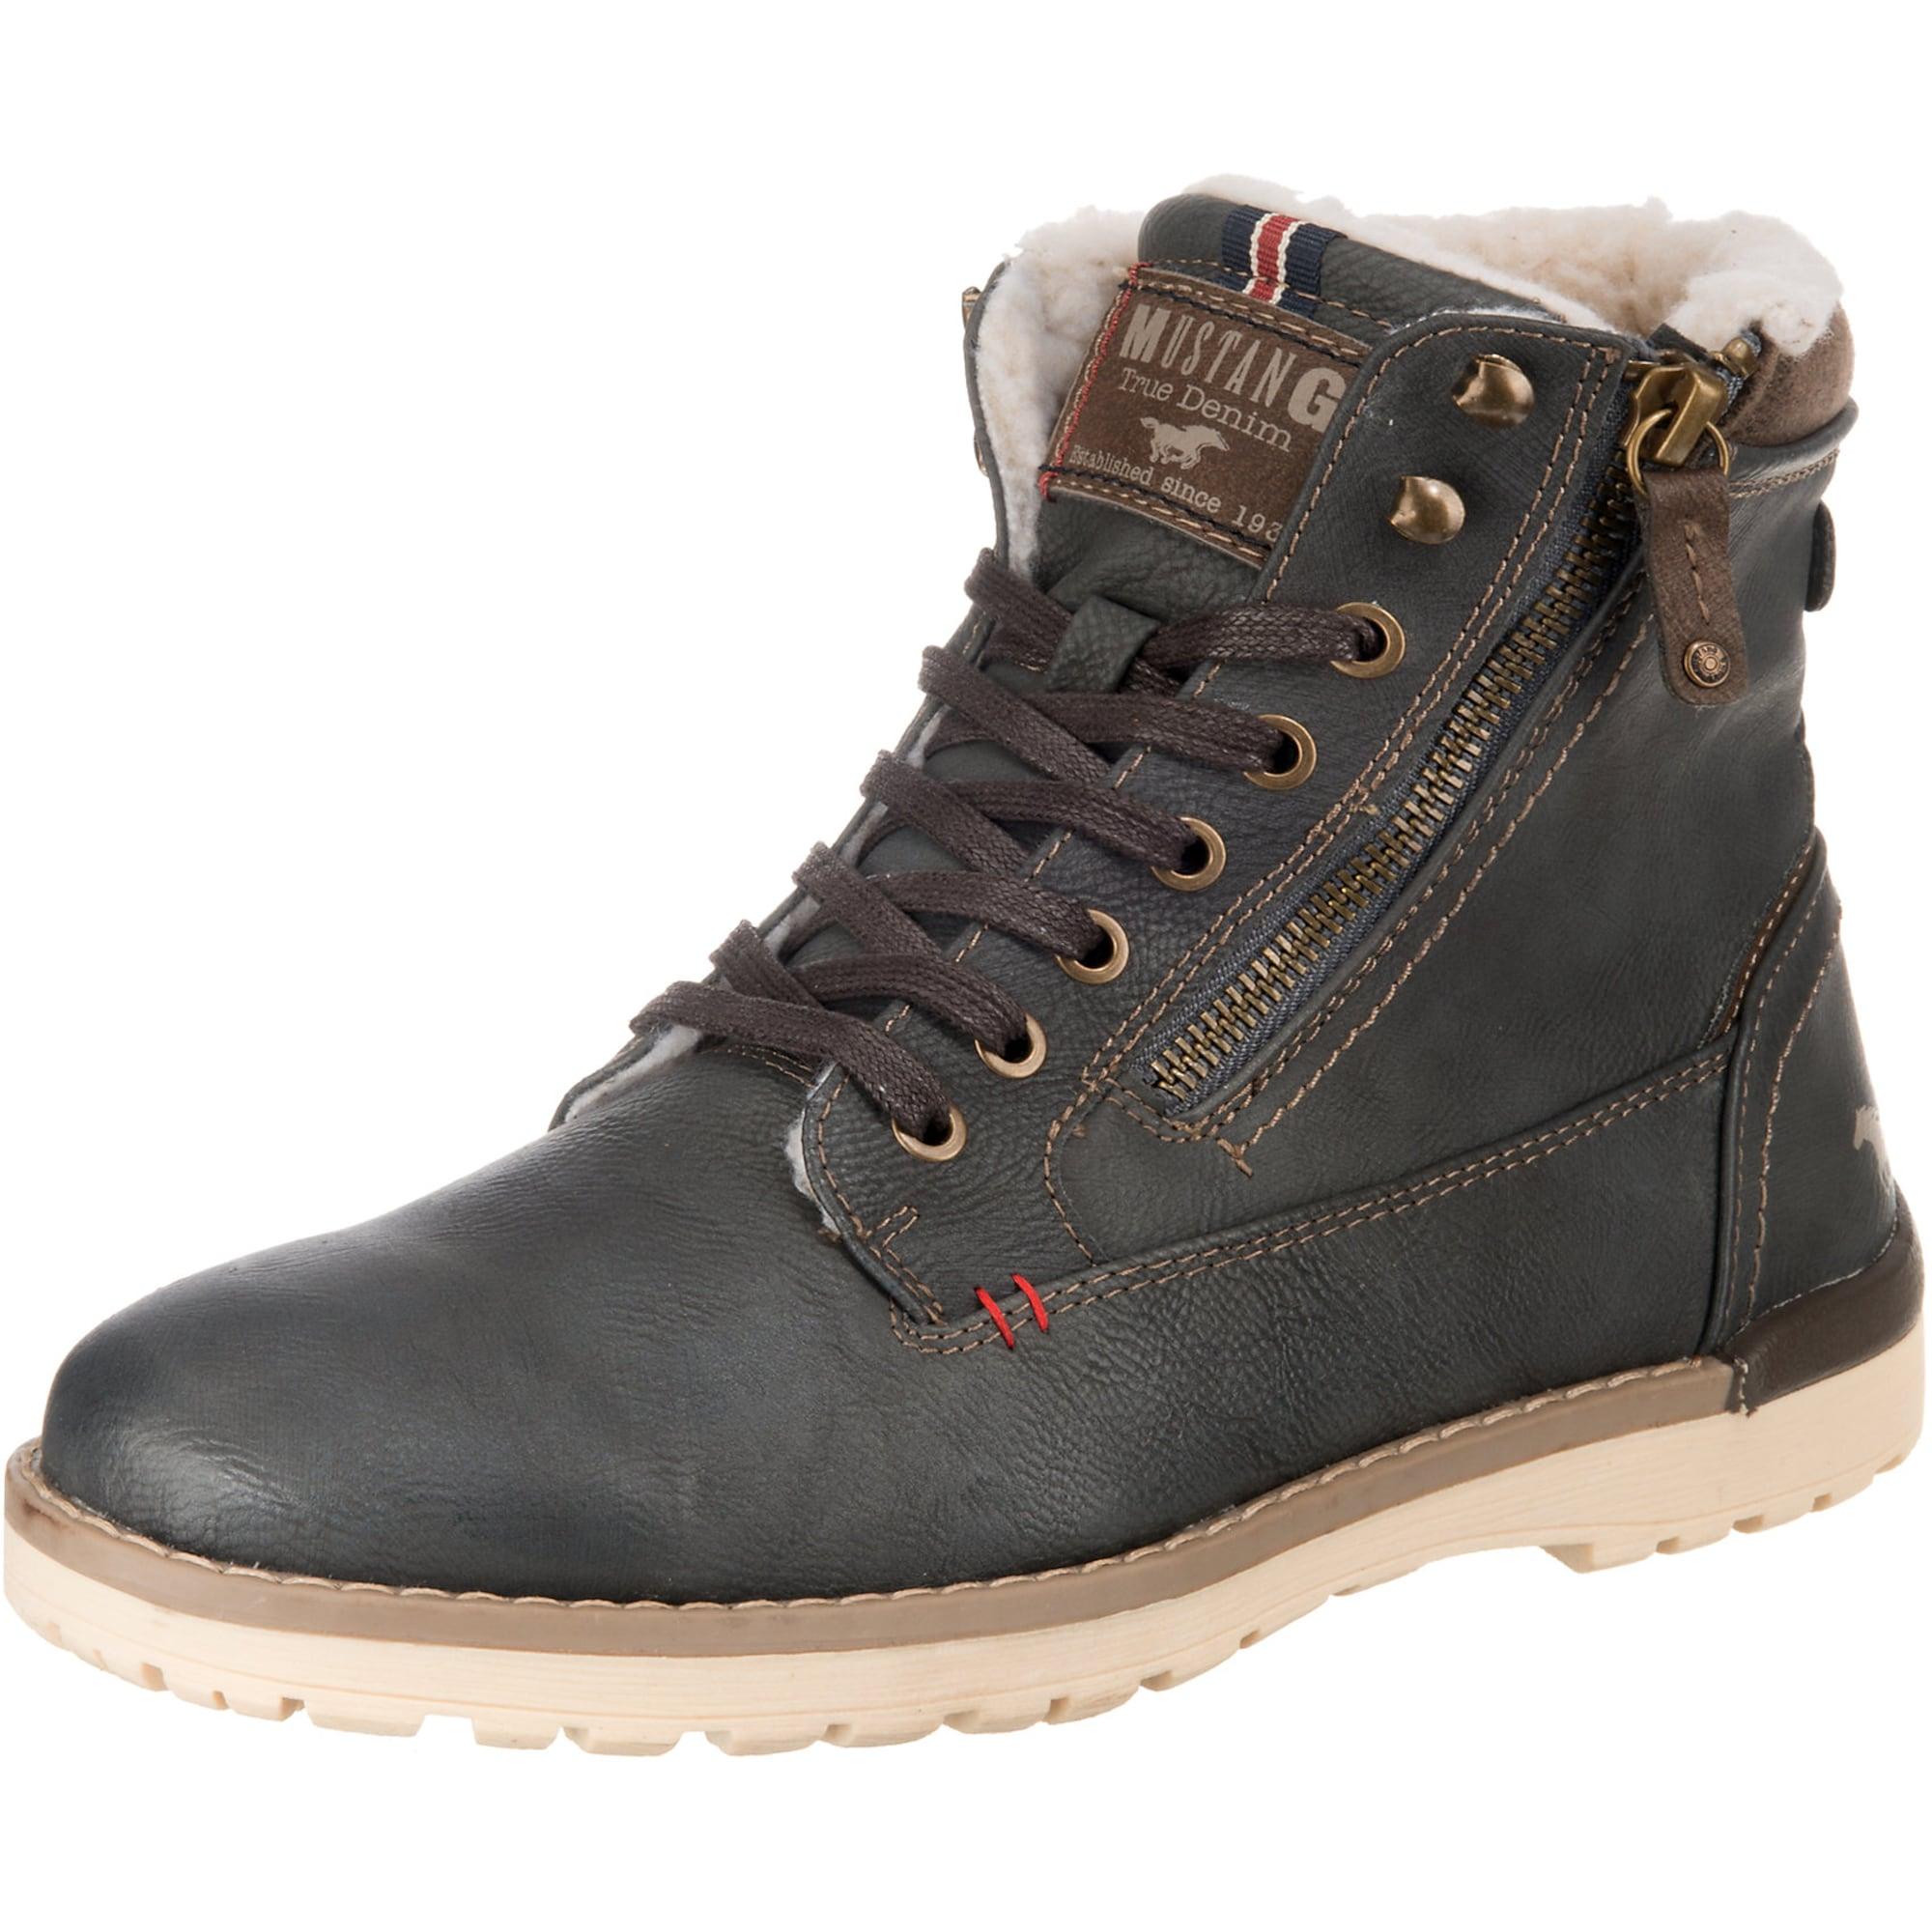 Winterstiefel | Schuhe > Boots > Winterstiefel | Grau | mustang